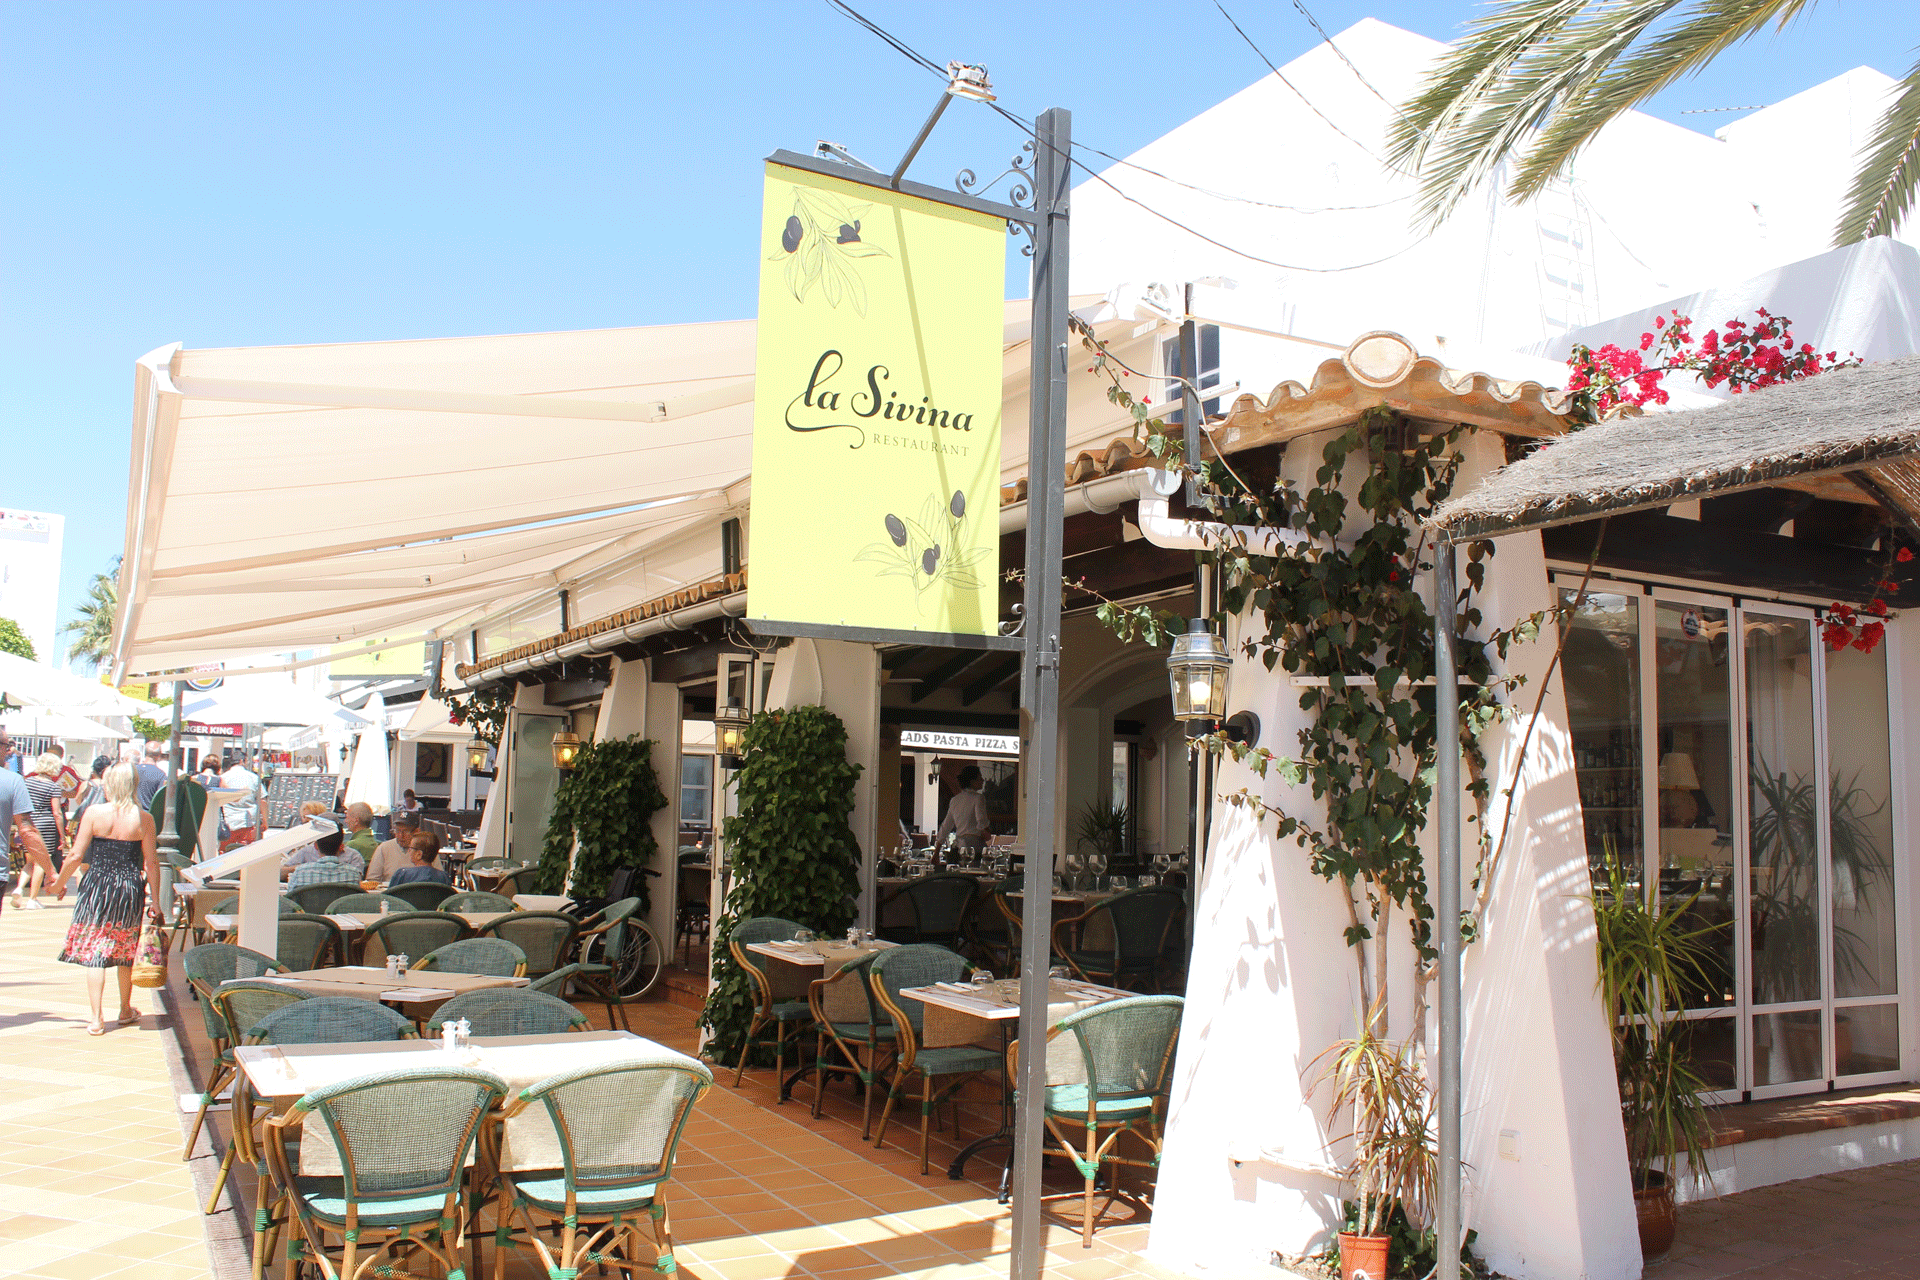 RestauranteLaSivina